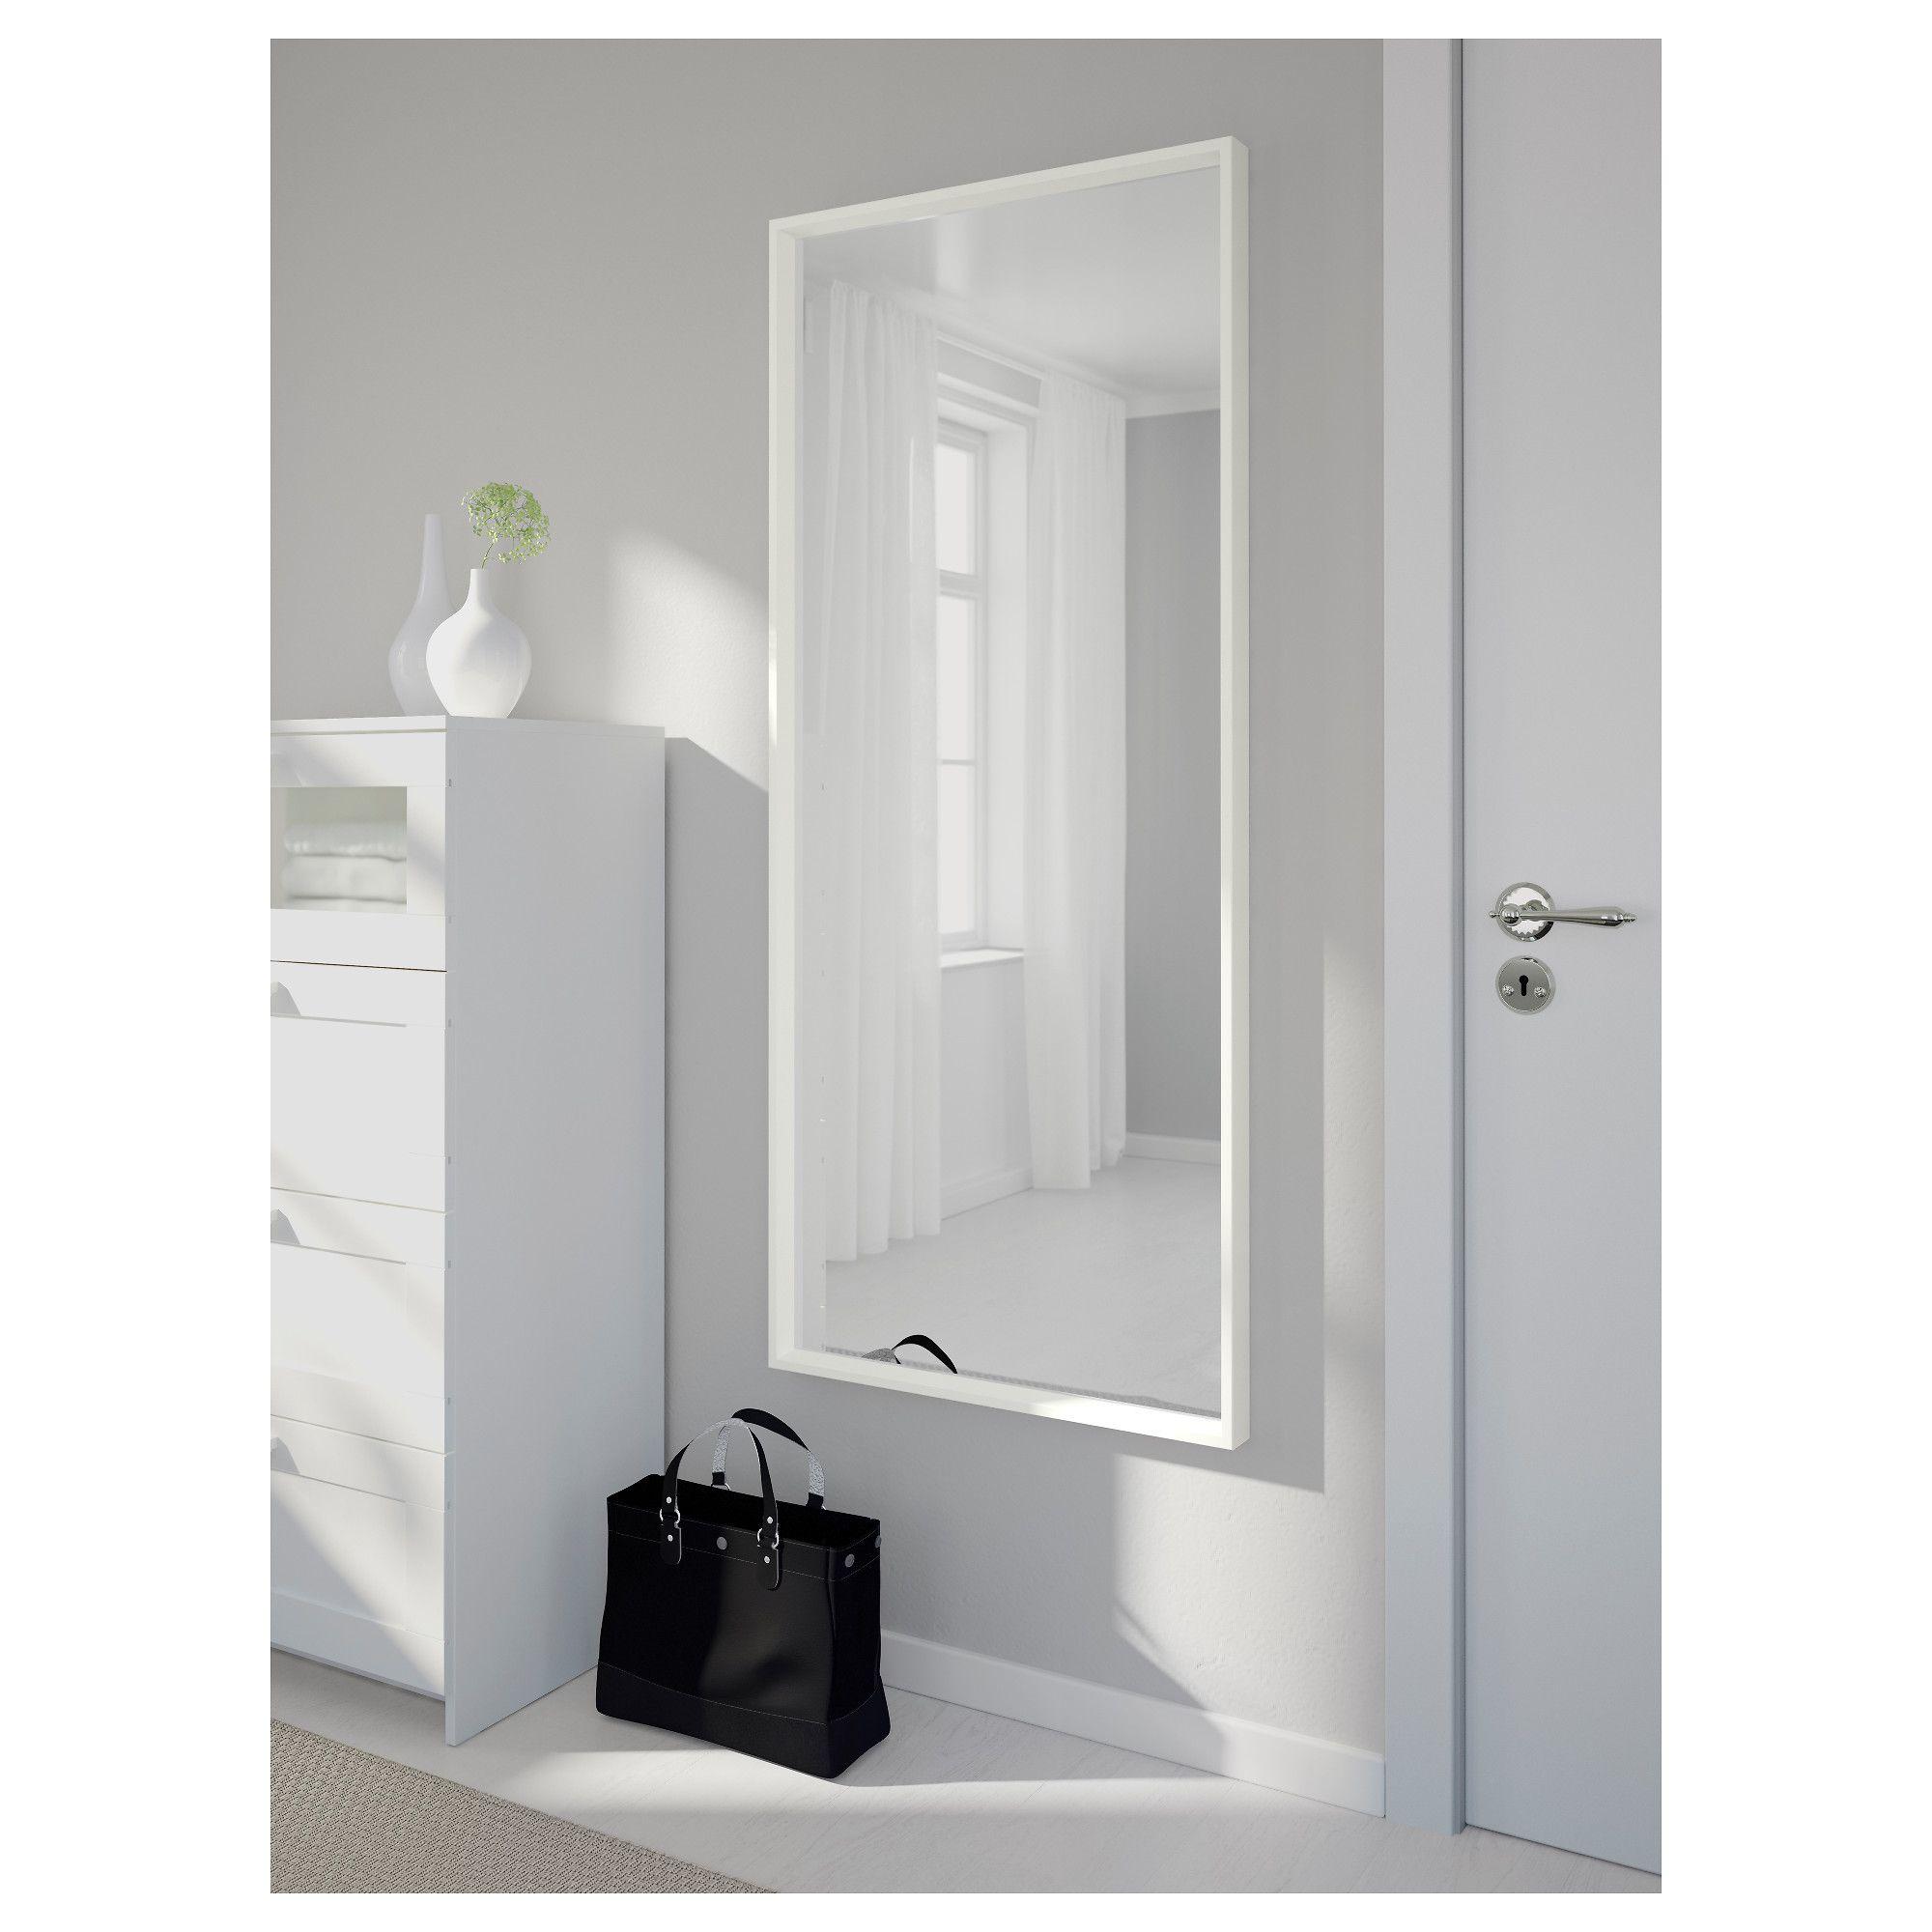 IKEA - NISSEDAL Mirror white | Ikea mirror, Ikea nissedal ...